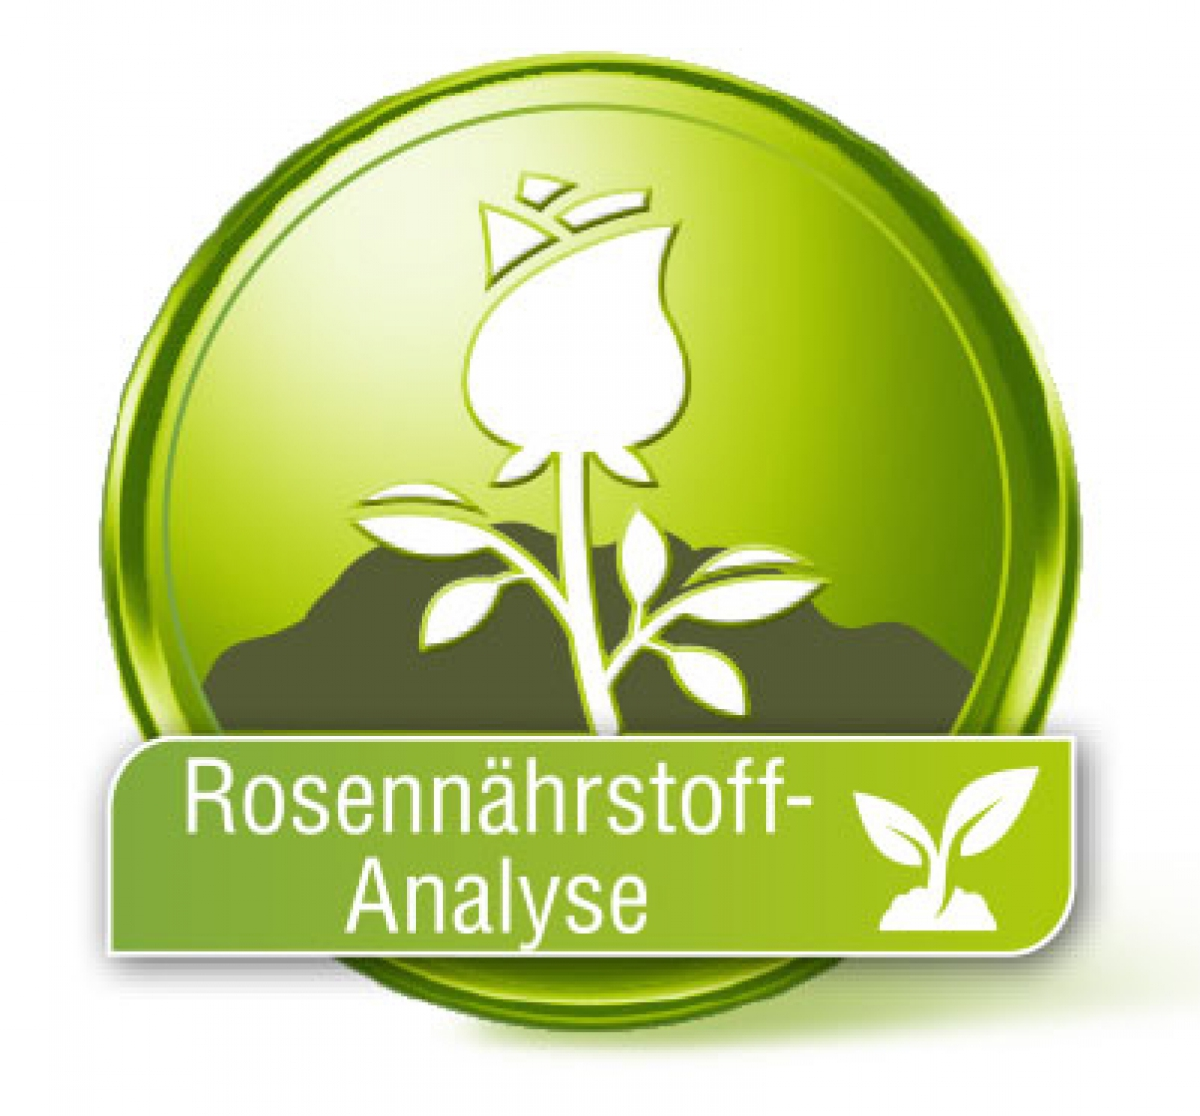 Bodennährstoff-Analyse